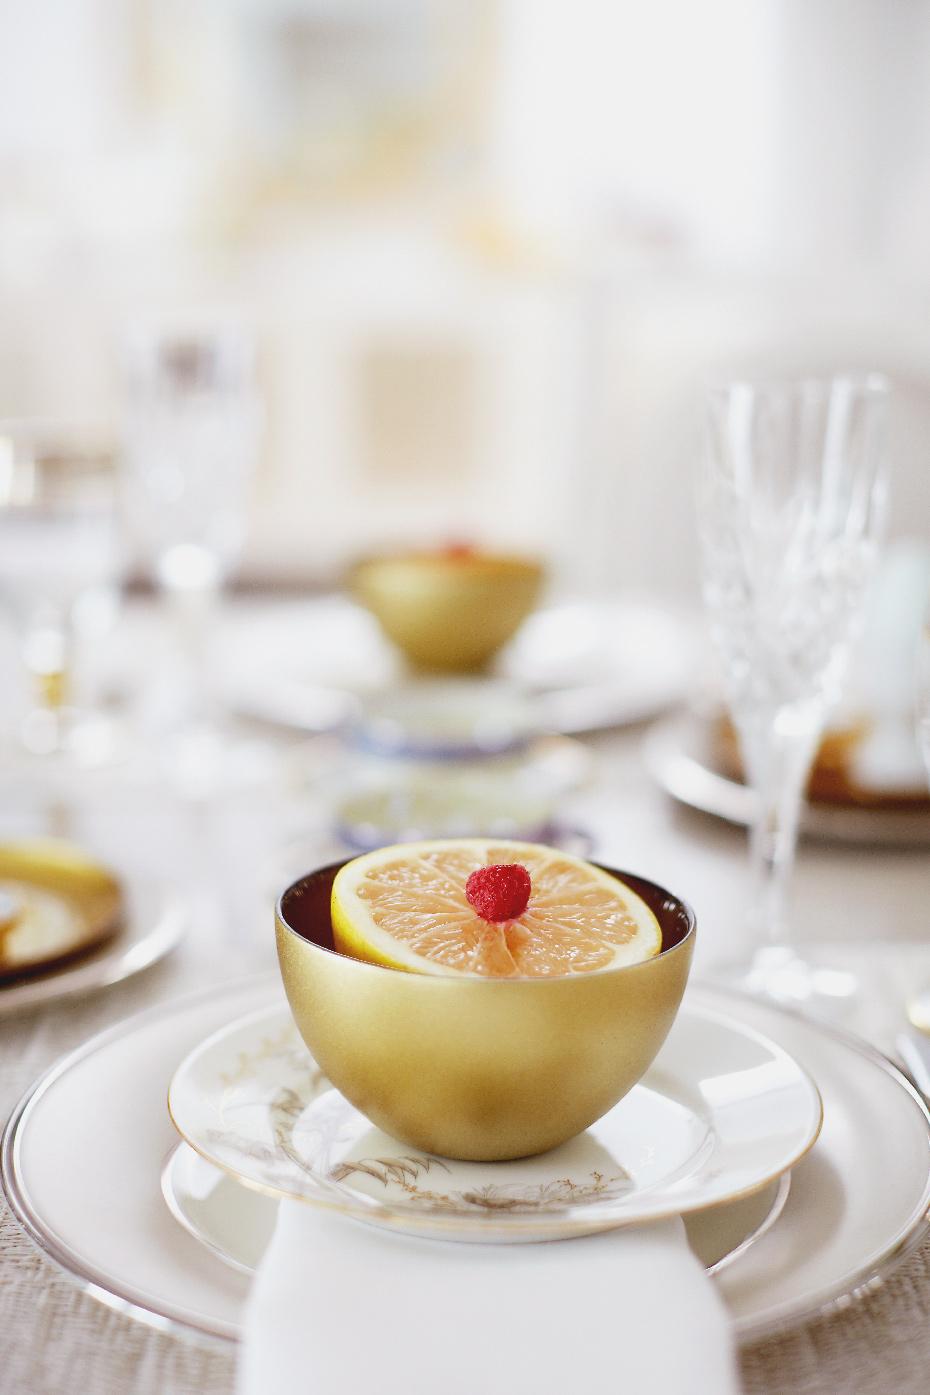 Stacey Van Berkel Photography I Elegant breakfast of raspberry topped grapefruit